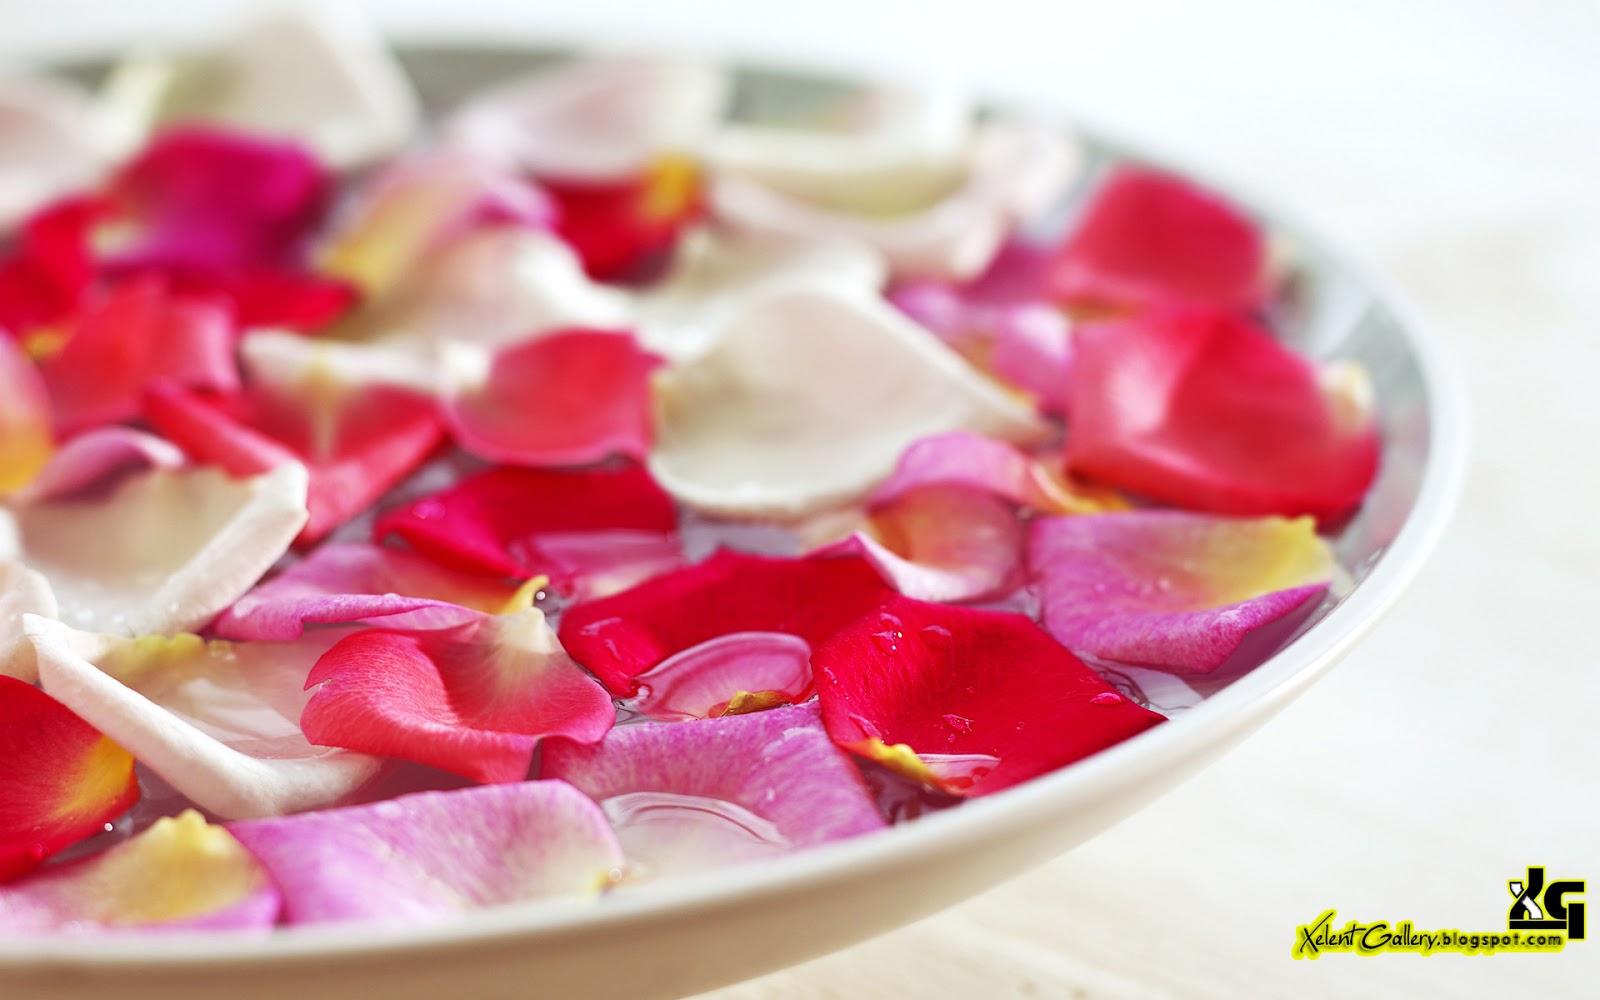 http://1.bp.blogspot.com/-VkUOmm5lpbo/UO3mfUO8PEI/AAAAAAAACSE/NL5FU1wAi6c/s1600/HD+Flower+Wallpapers+%25285%2529.JPG